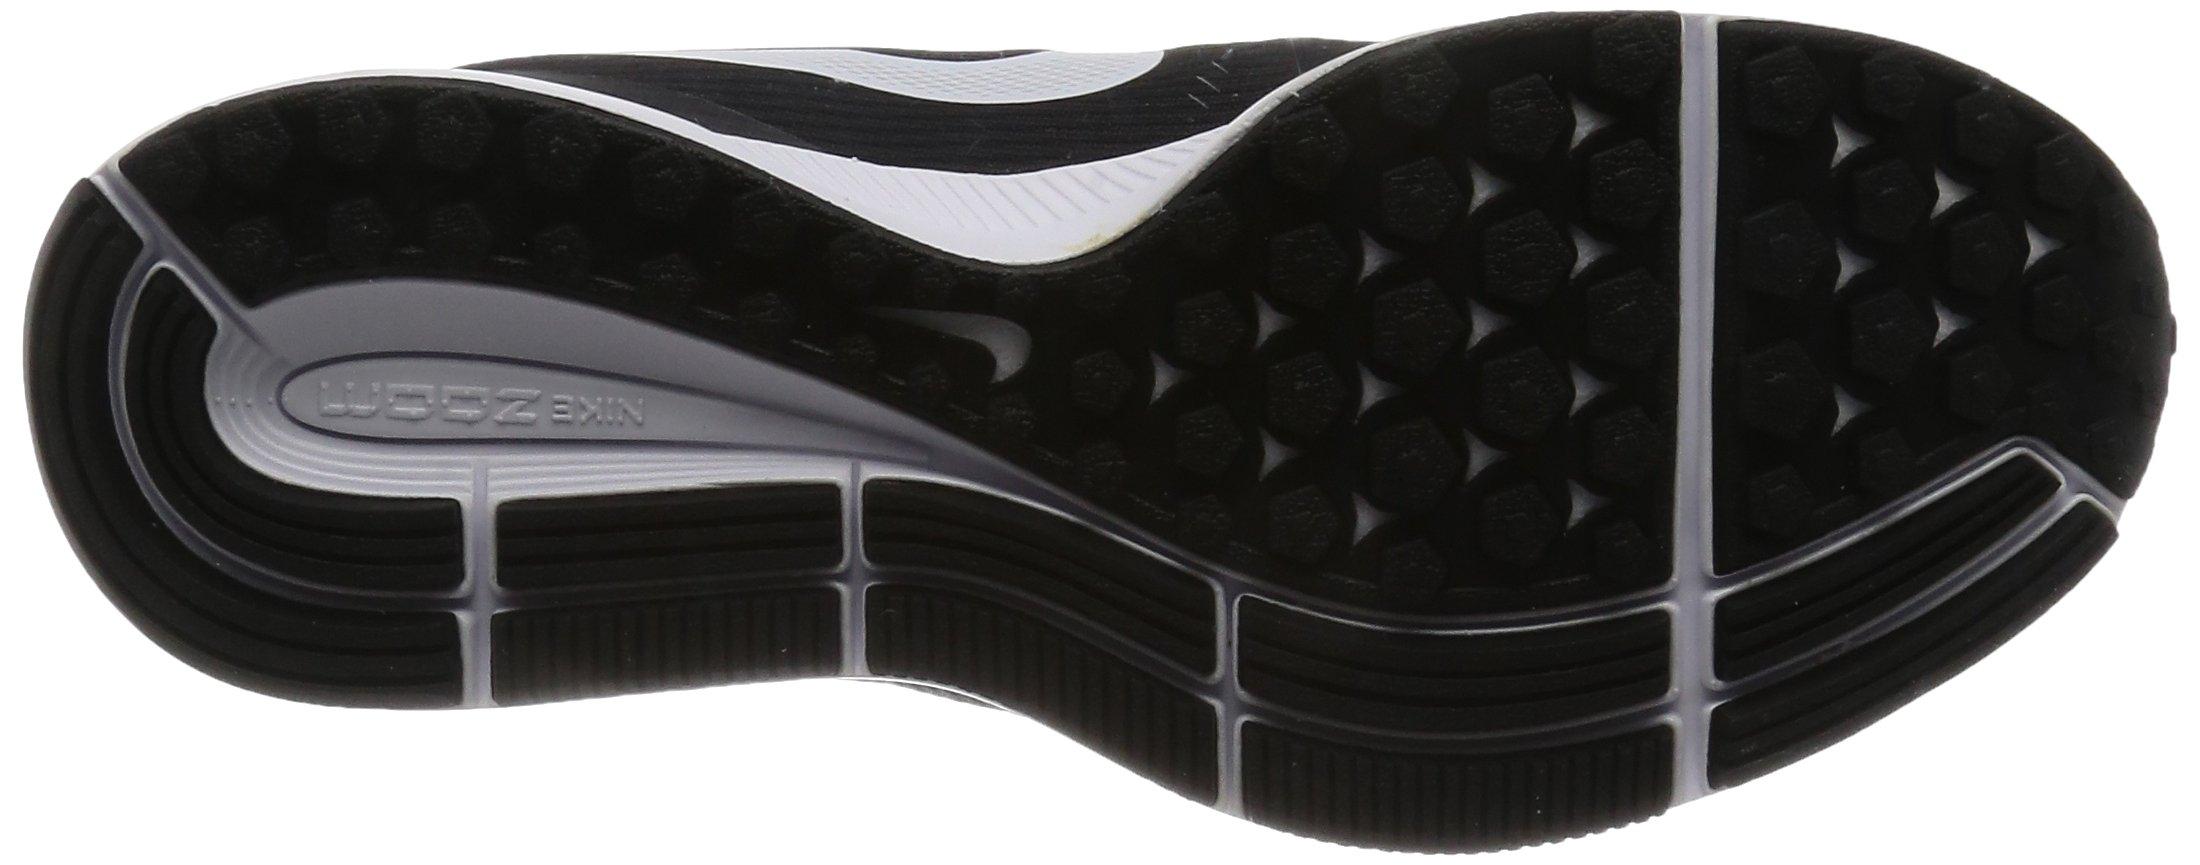 Nike Womens Air Zoom Pegasus 34 Black/White/Dark Grey/Anthracite Running Shoes (6) by Nike (Image #3)